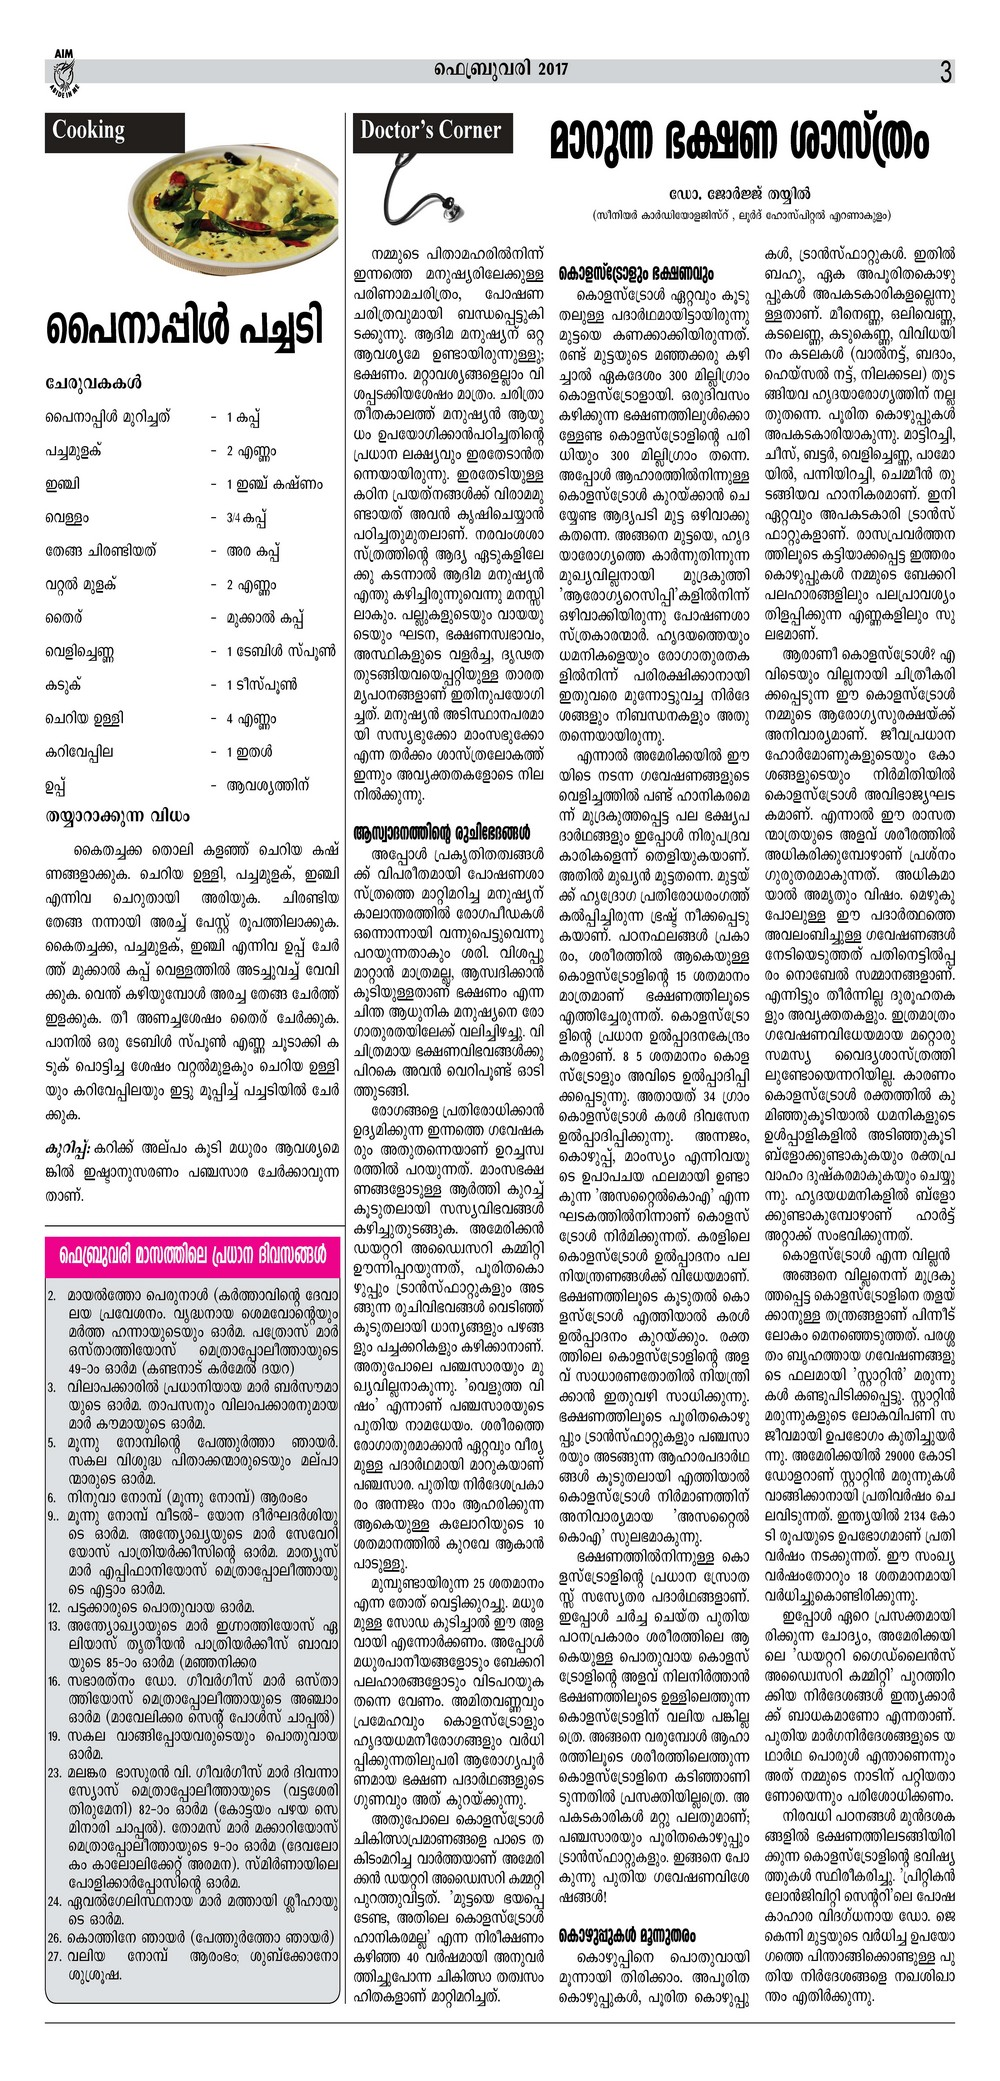 AIM feb 17 final_Page_3